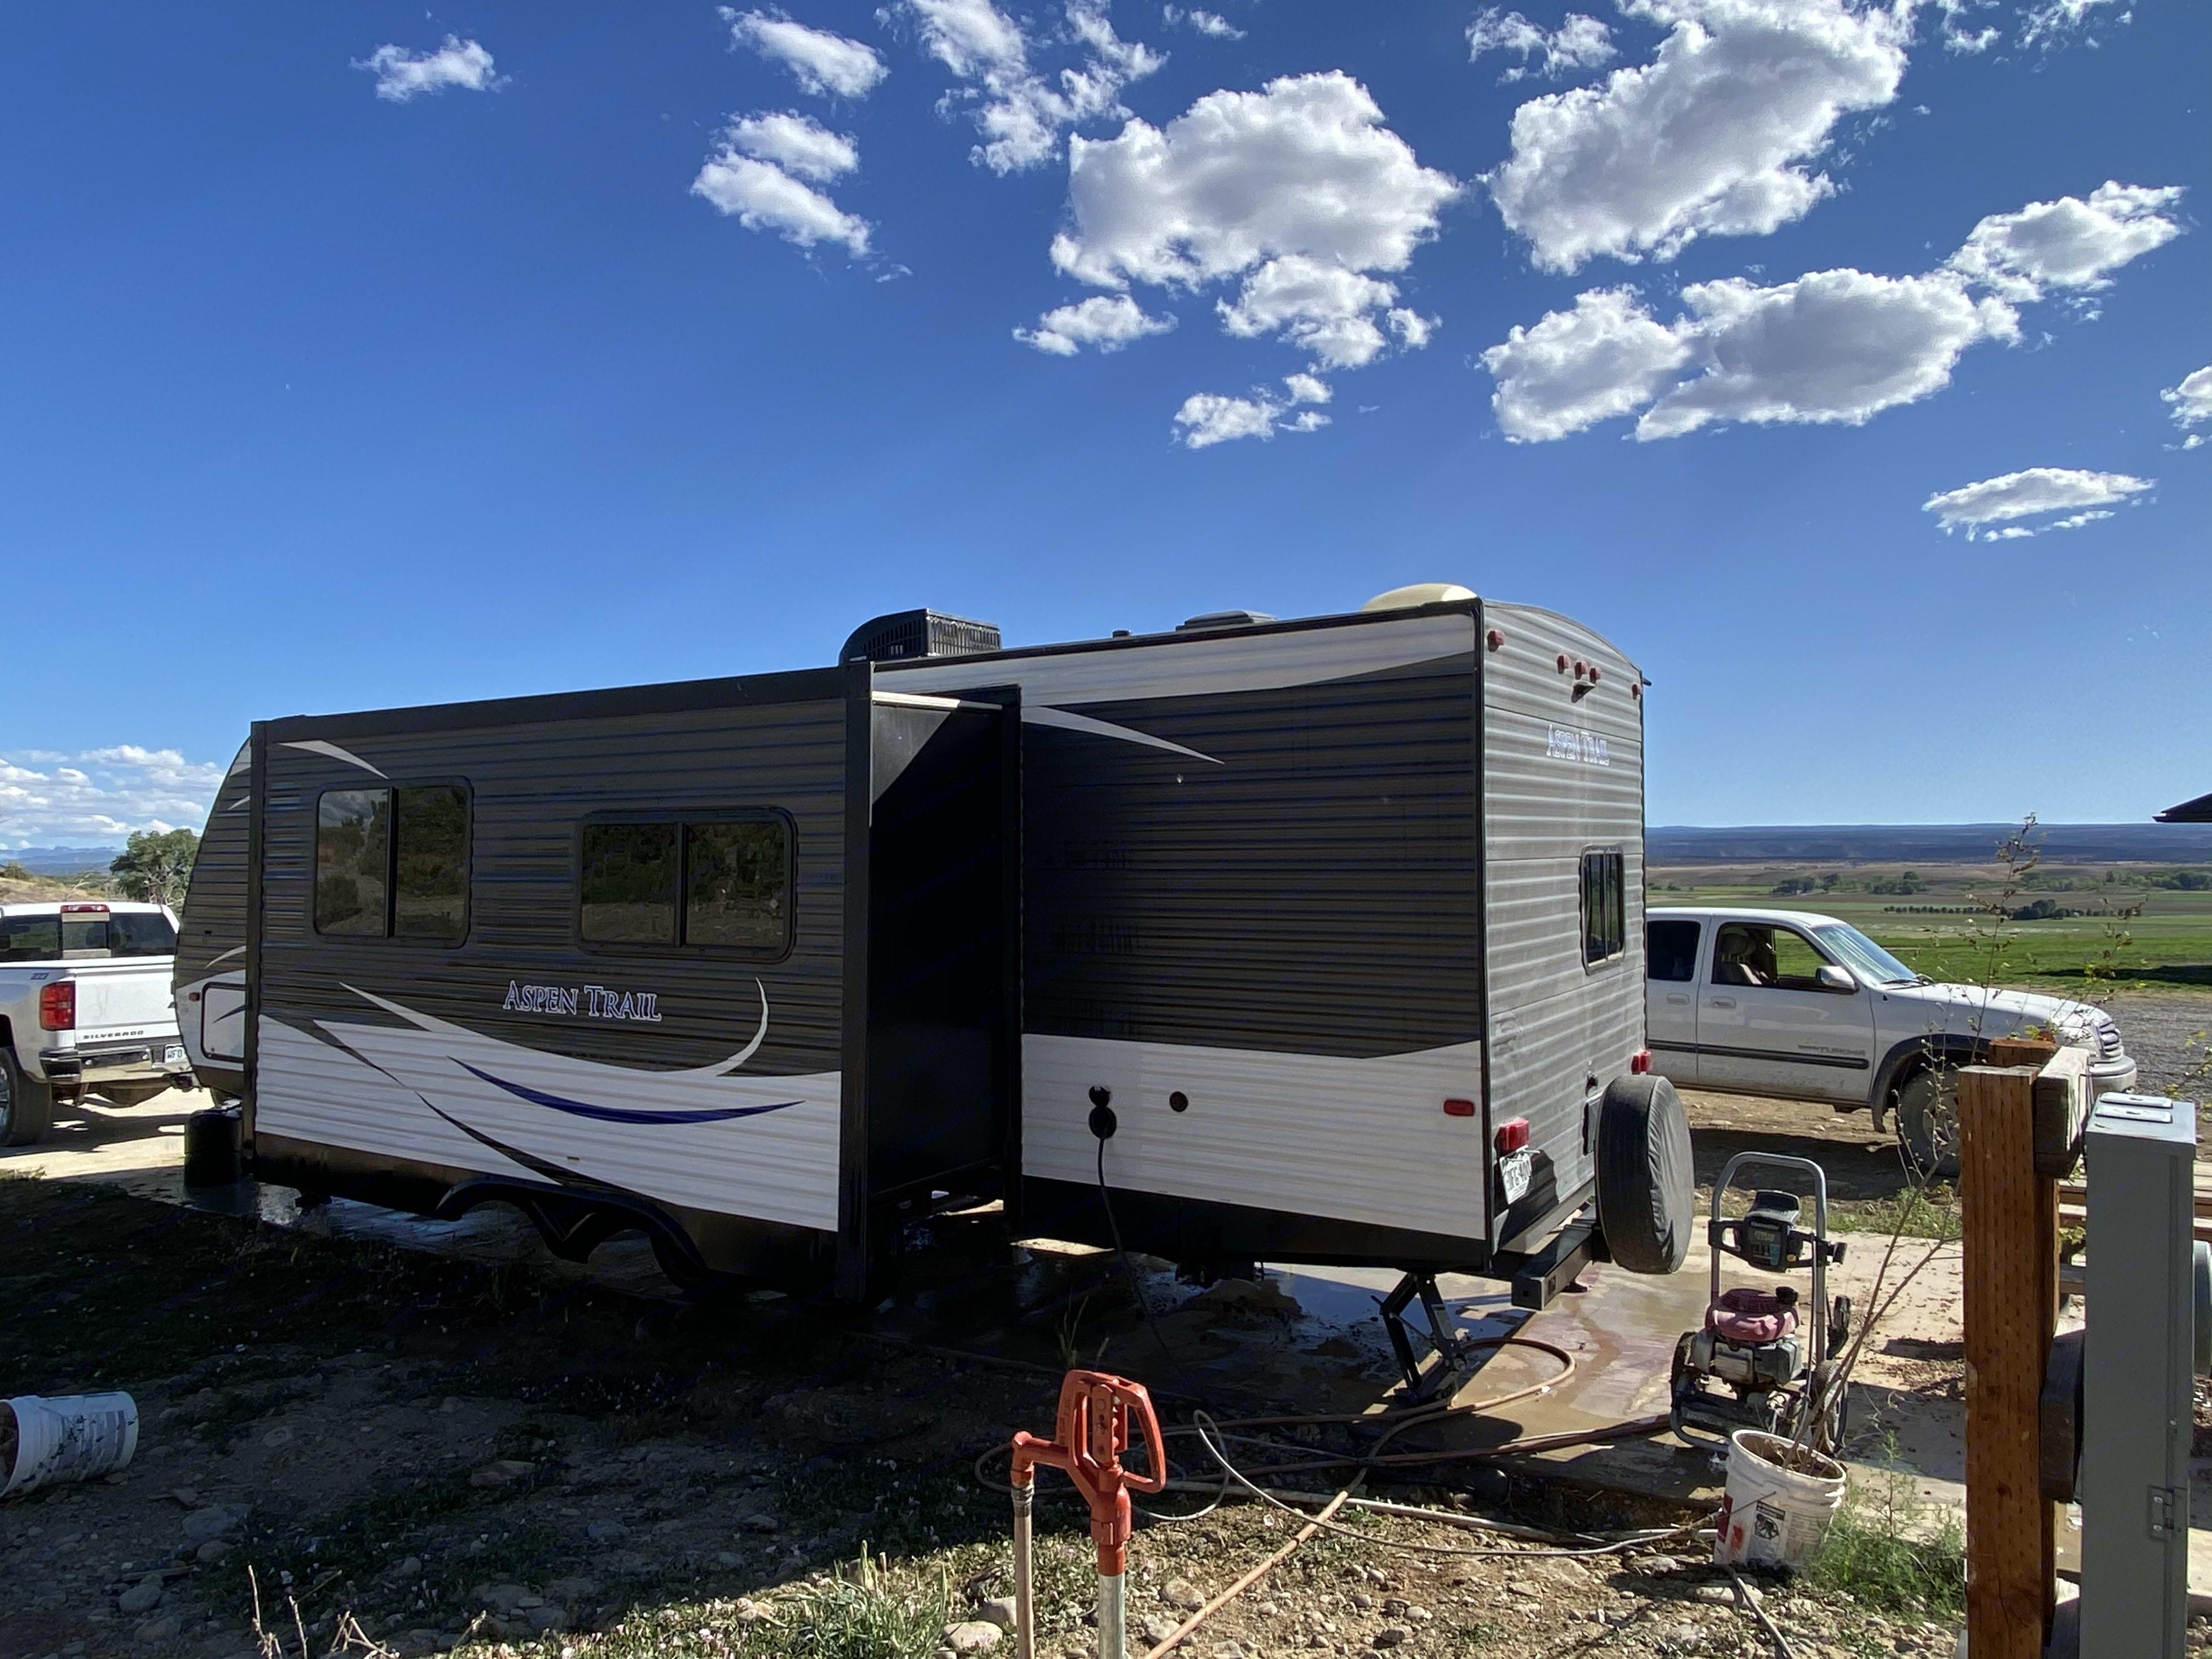 Keystone Aspen trail 2018